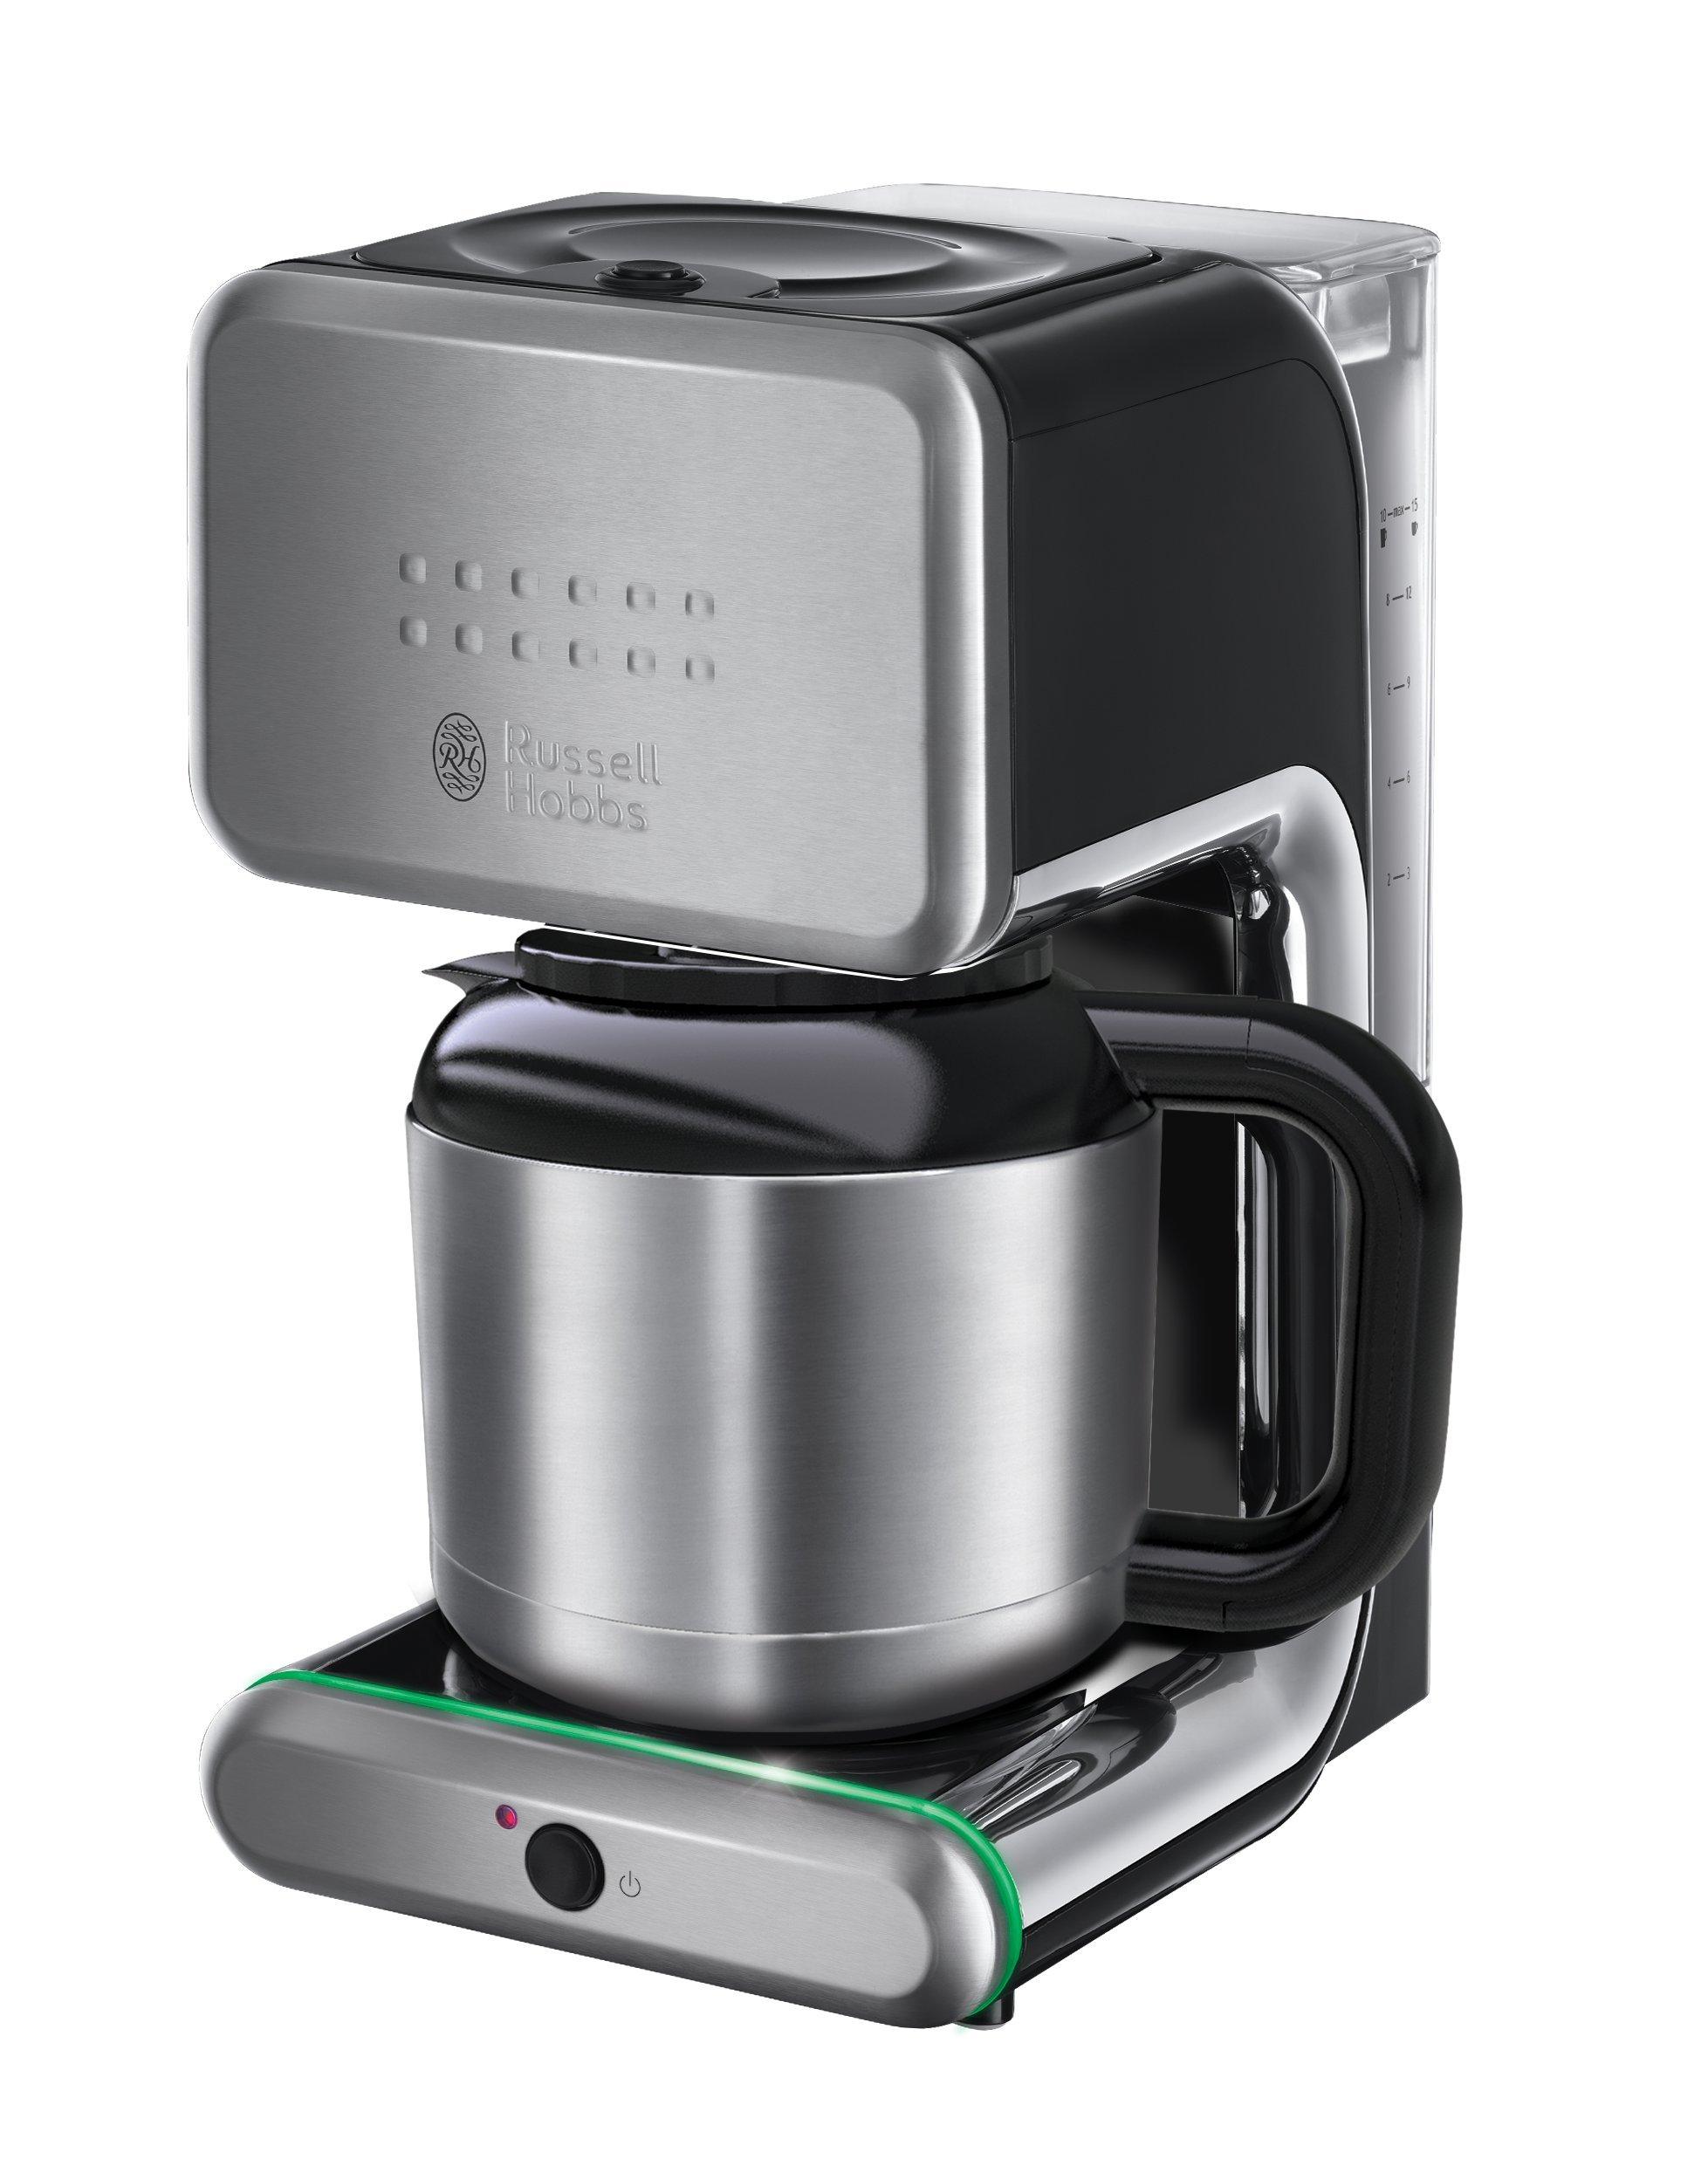 Russell Hobbs 20181-56 Illumina - Cafetera digital térmica, acero inoxidable brillante, anillo de luz de color cambiante, jarra térmica: Amazon.es: Hogar